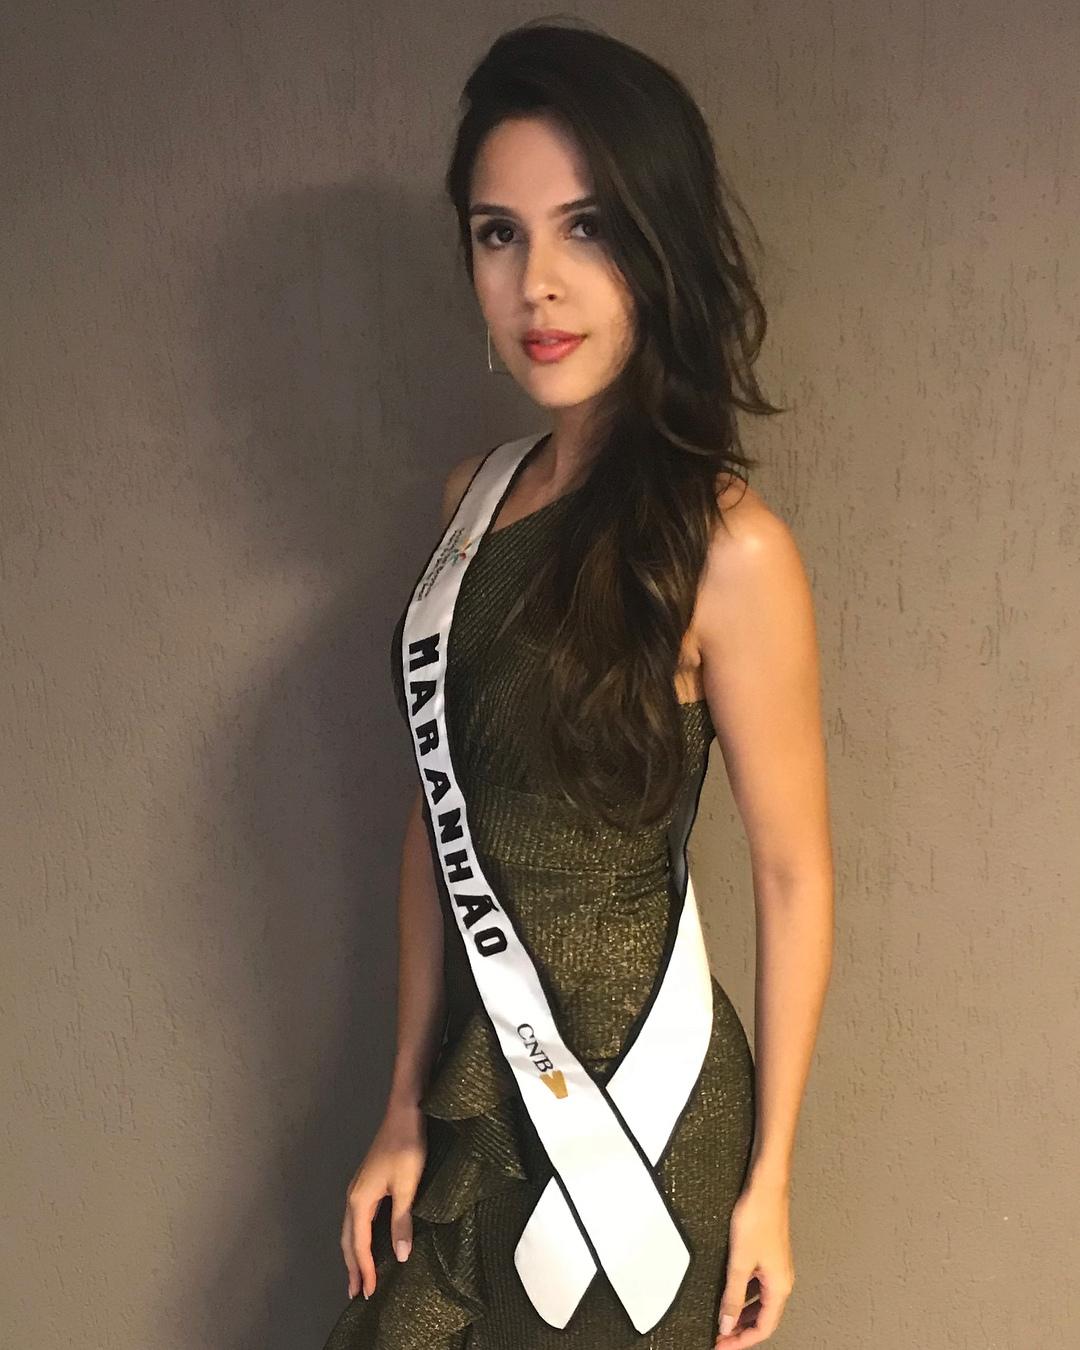 keren farias, miss maranhao mundo 2018. - Página 3 38707010